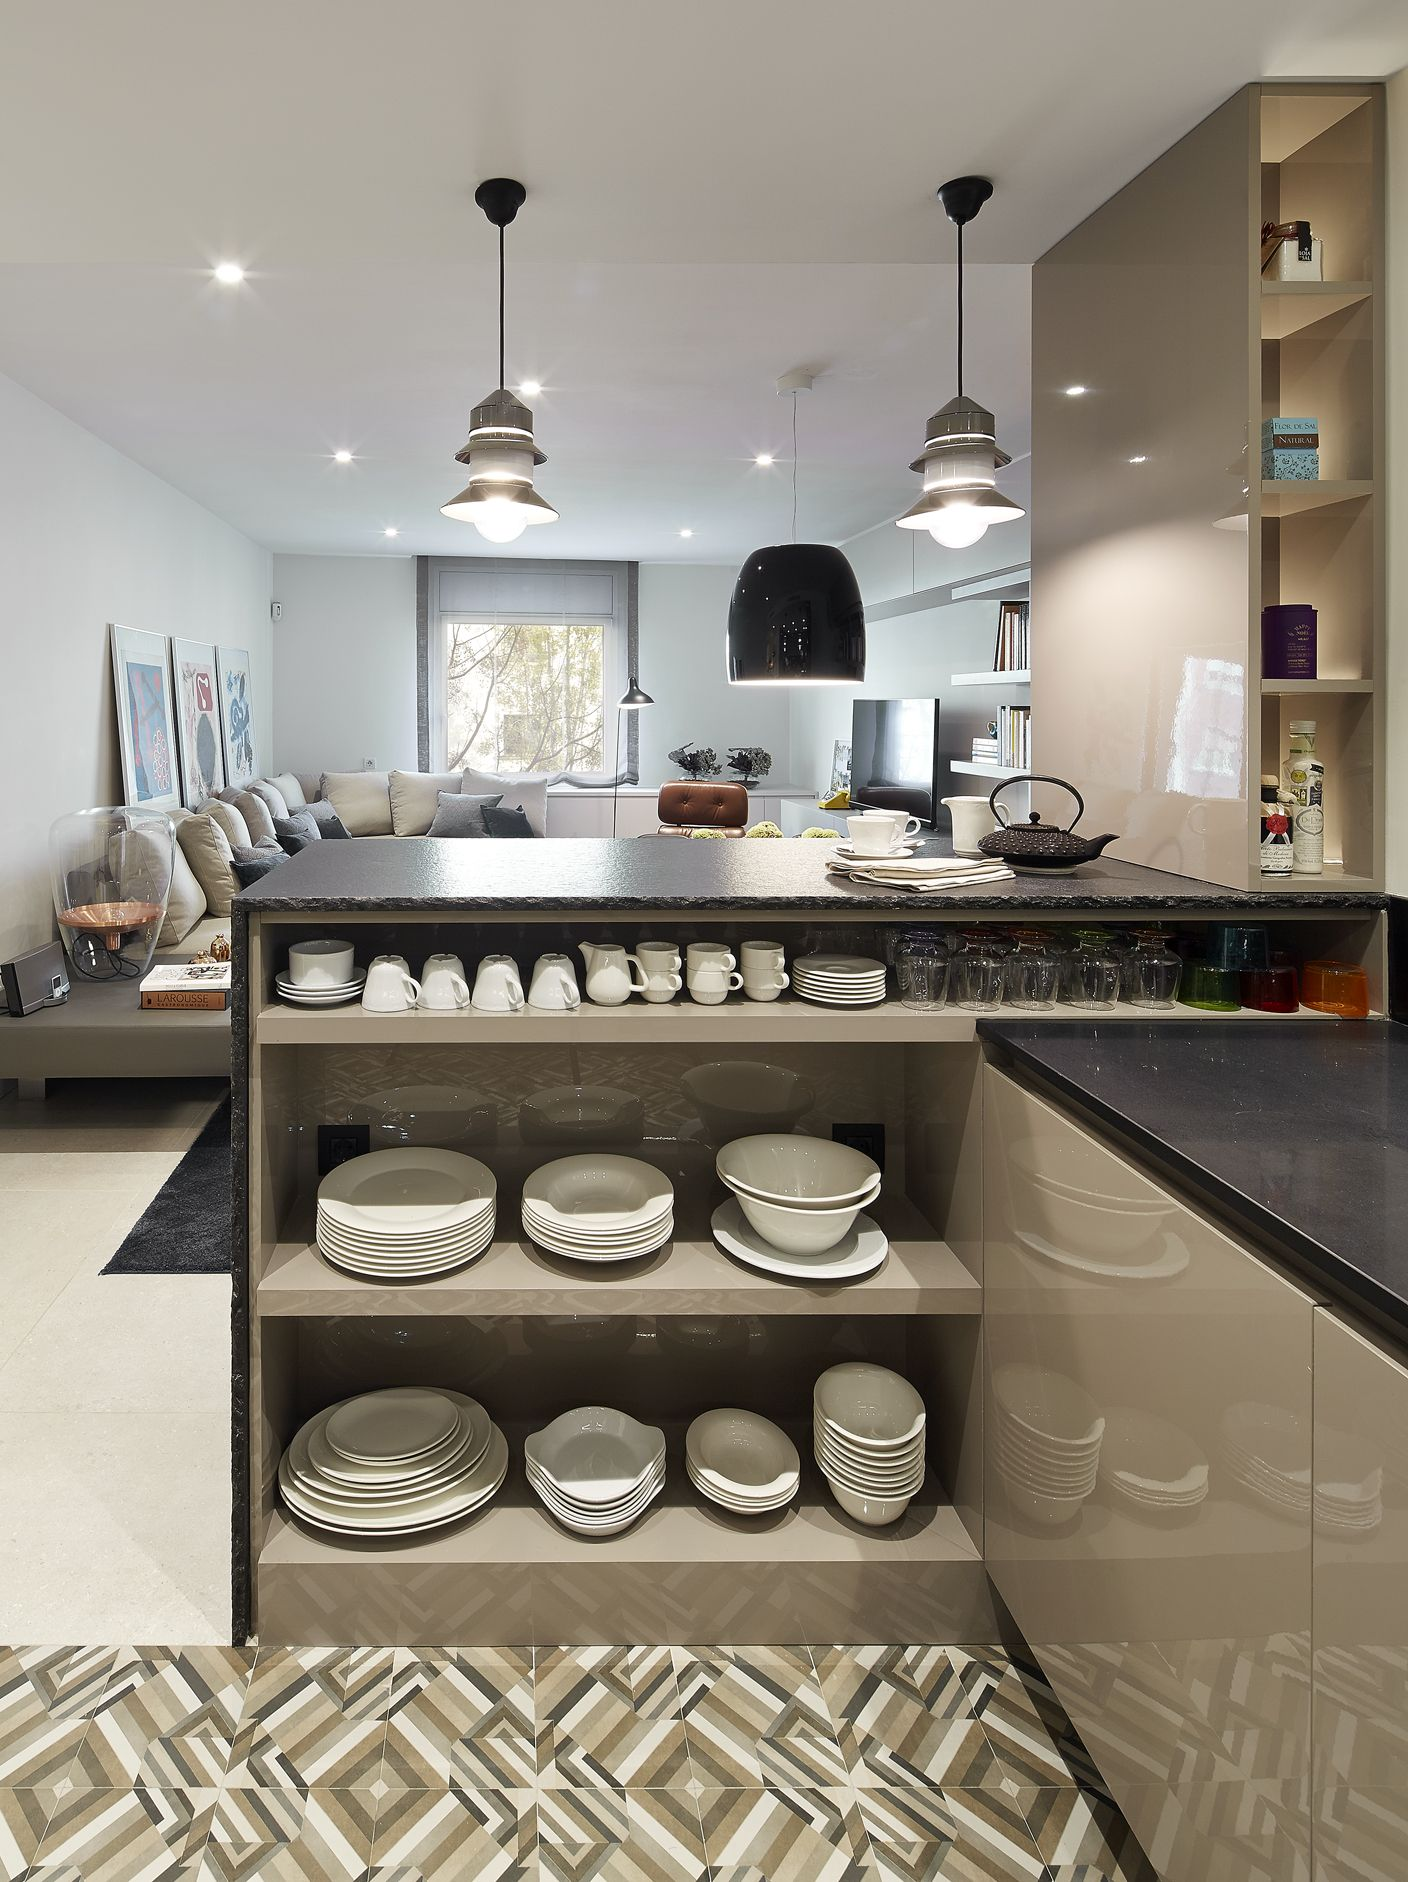 Molins interiors arquitectura interior interiorismo for Unir cocina y salon